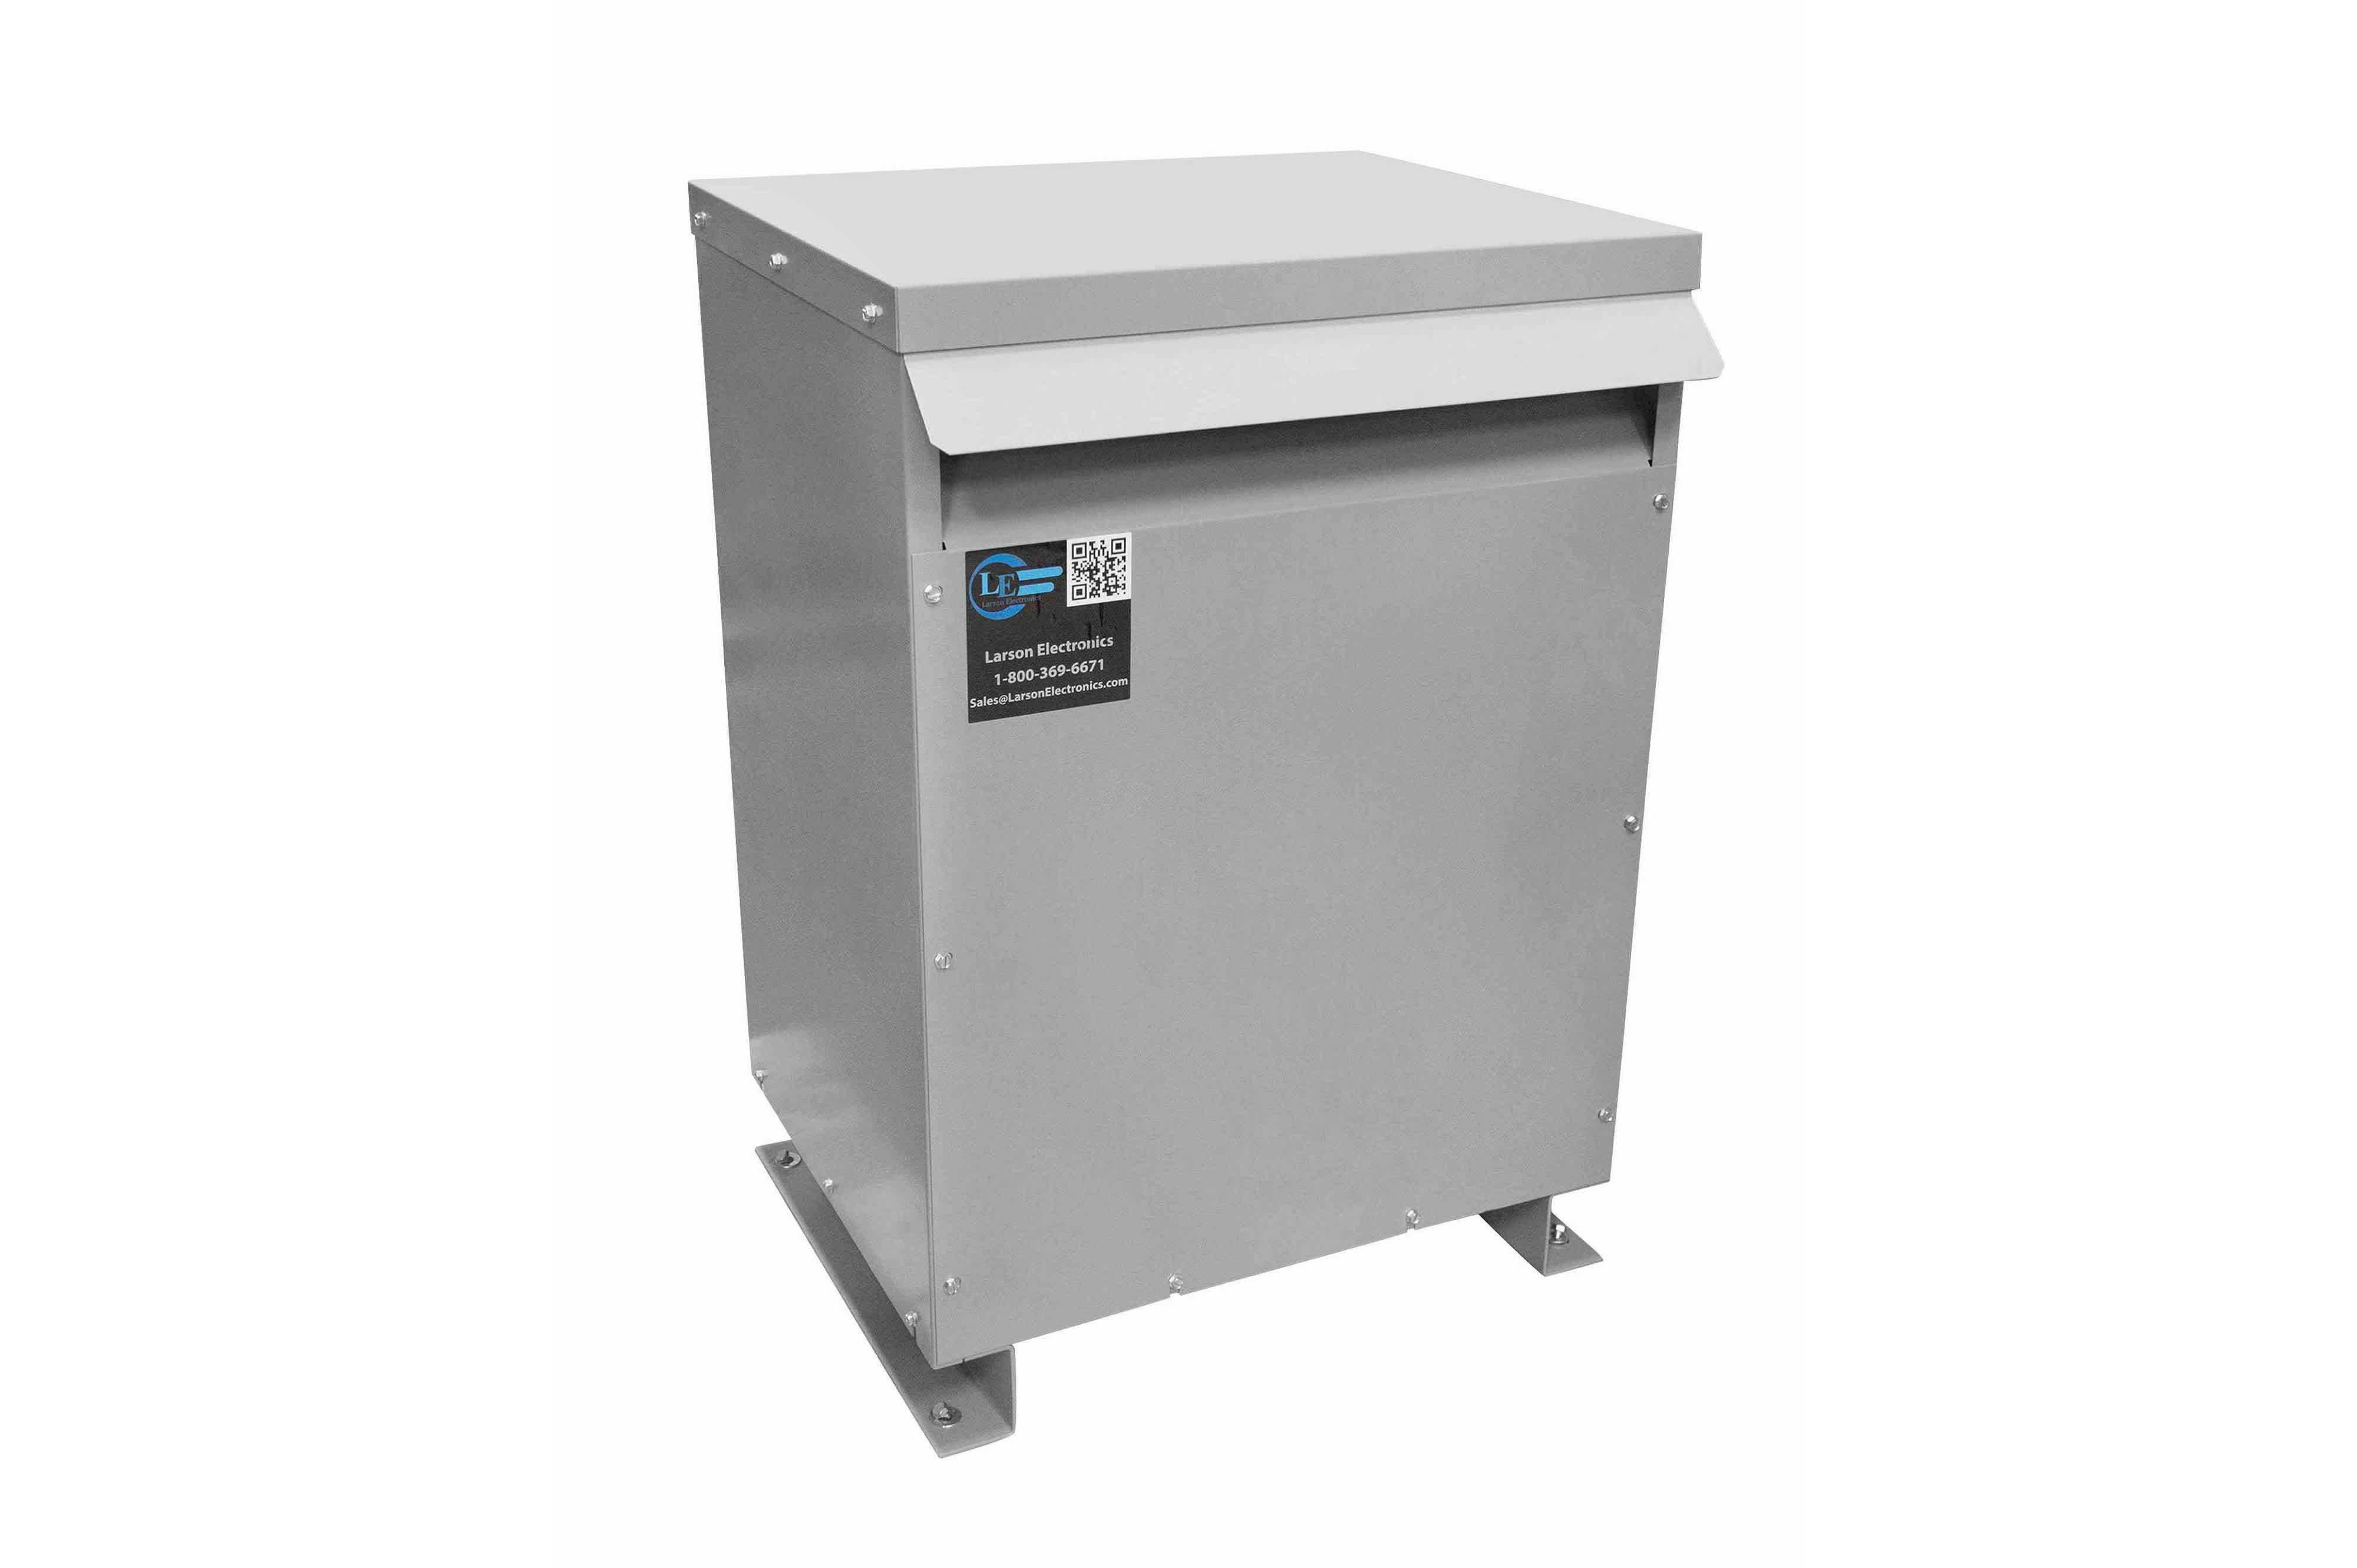 36 kVA 3PH Isolation Transformer, 480V Wye Primary, 400V Delta Secondary, N3R, Ventilated, 60 Hz